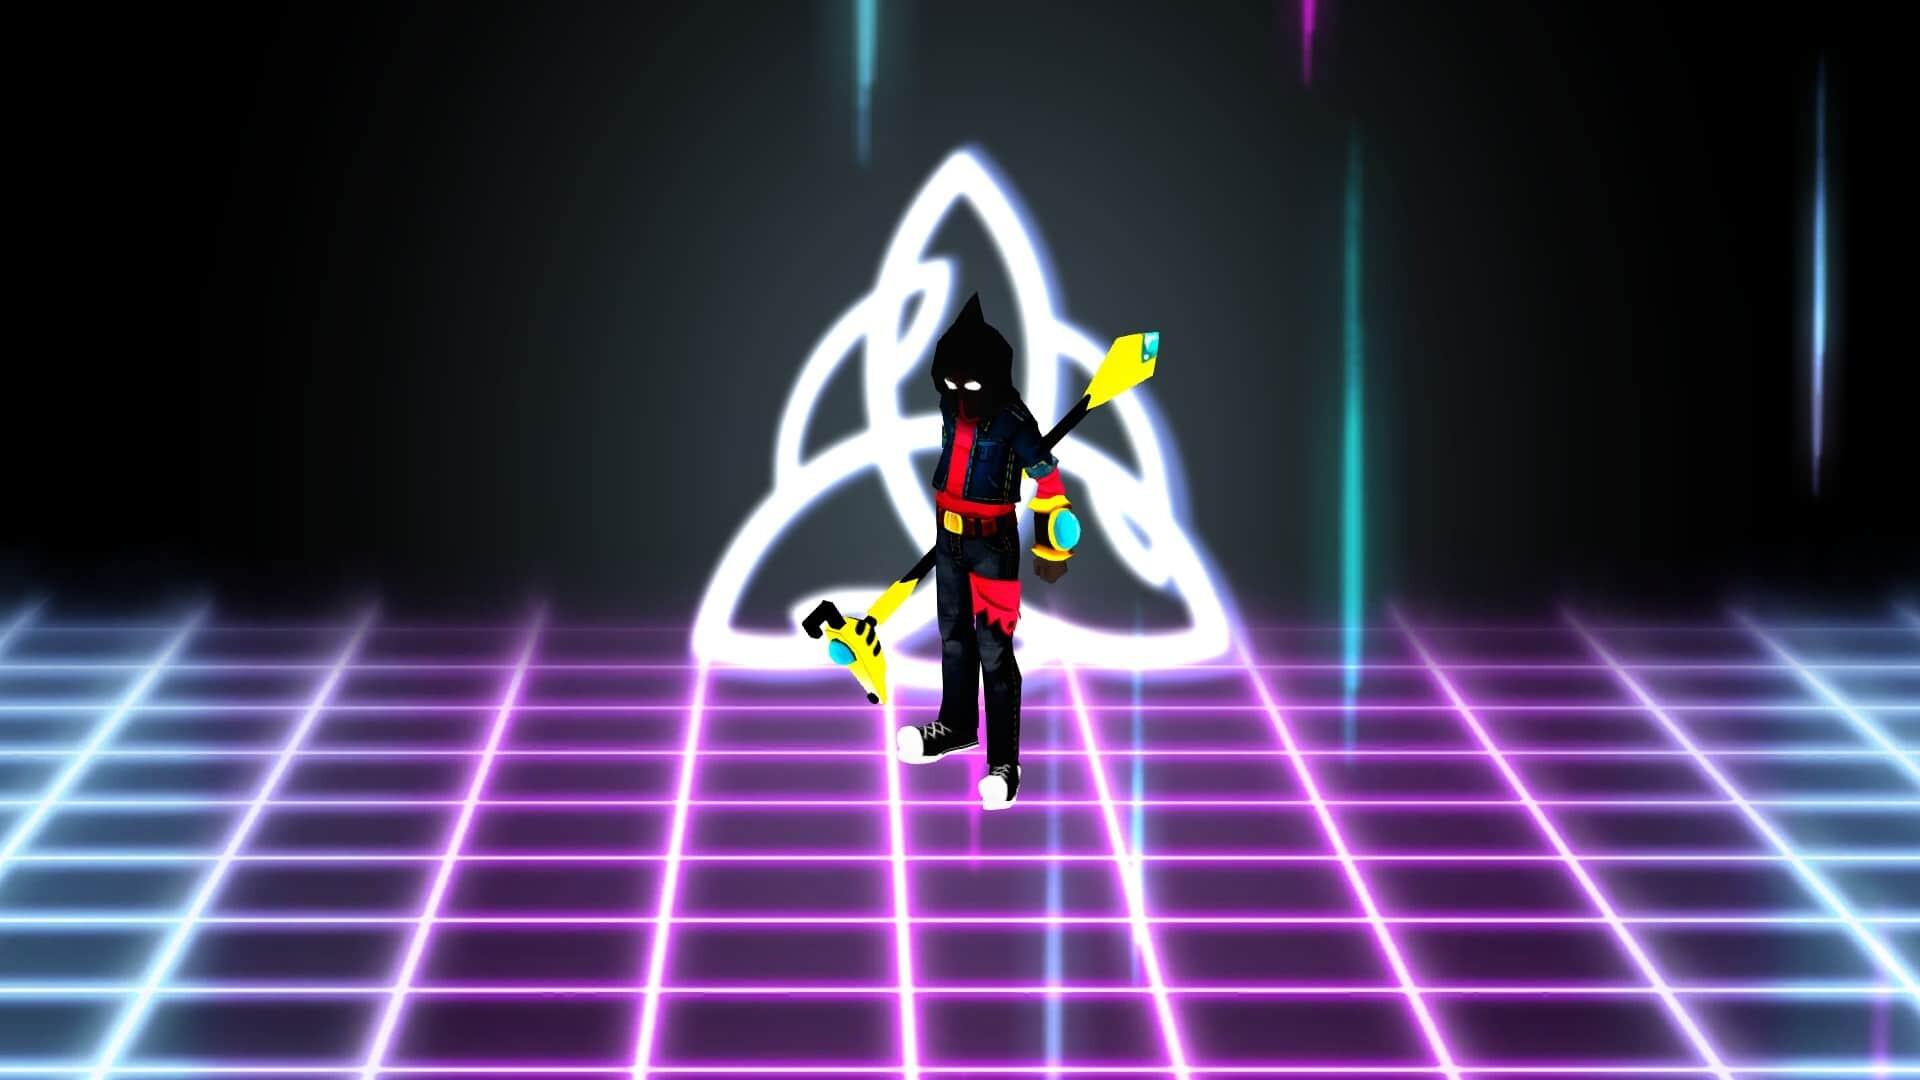 Megamagic game screenshot 4